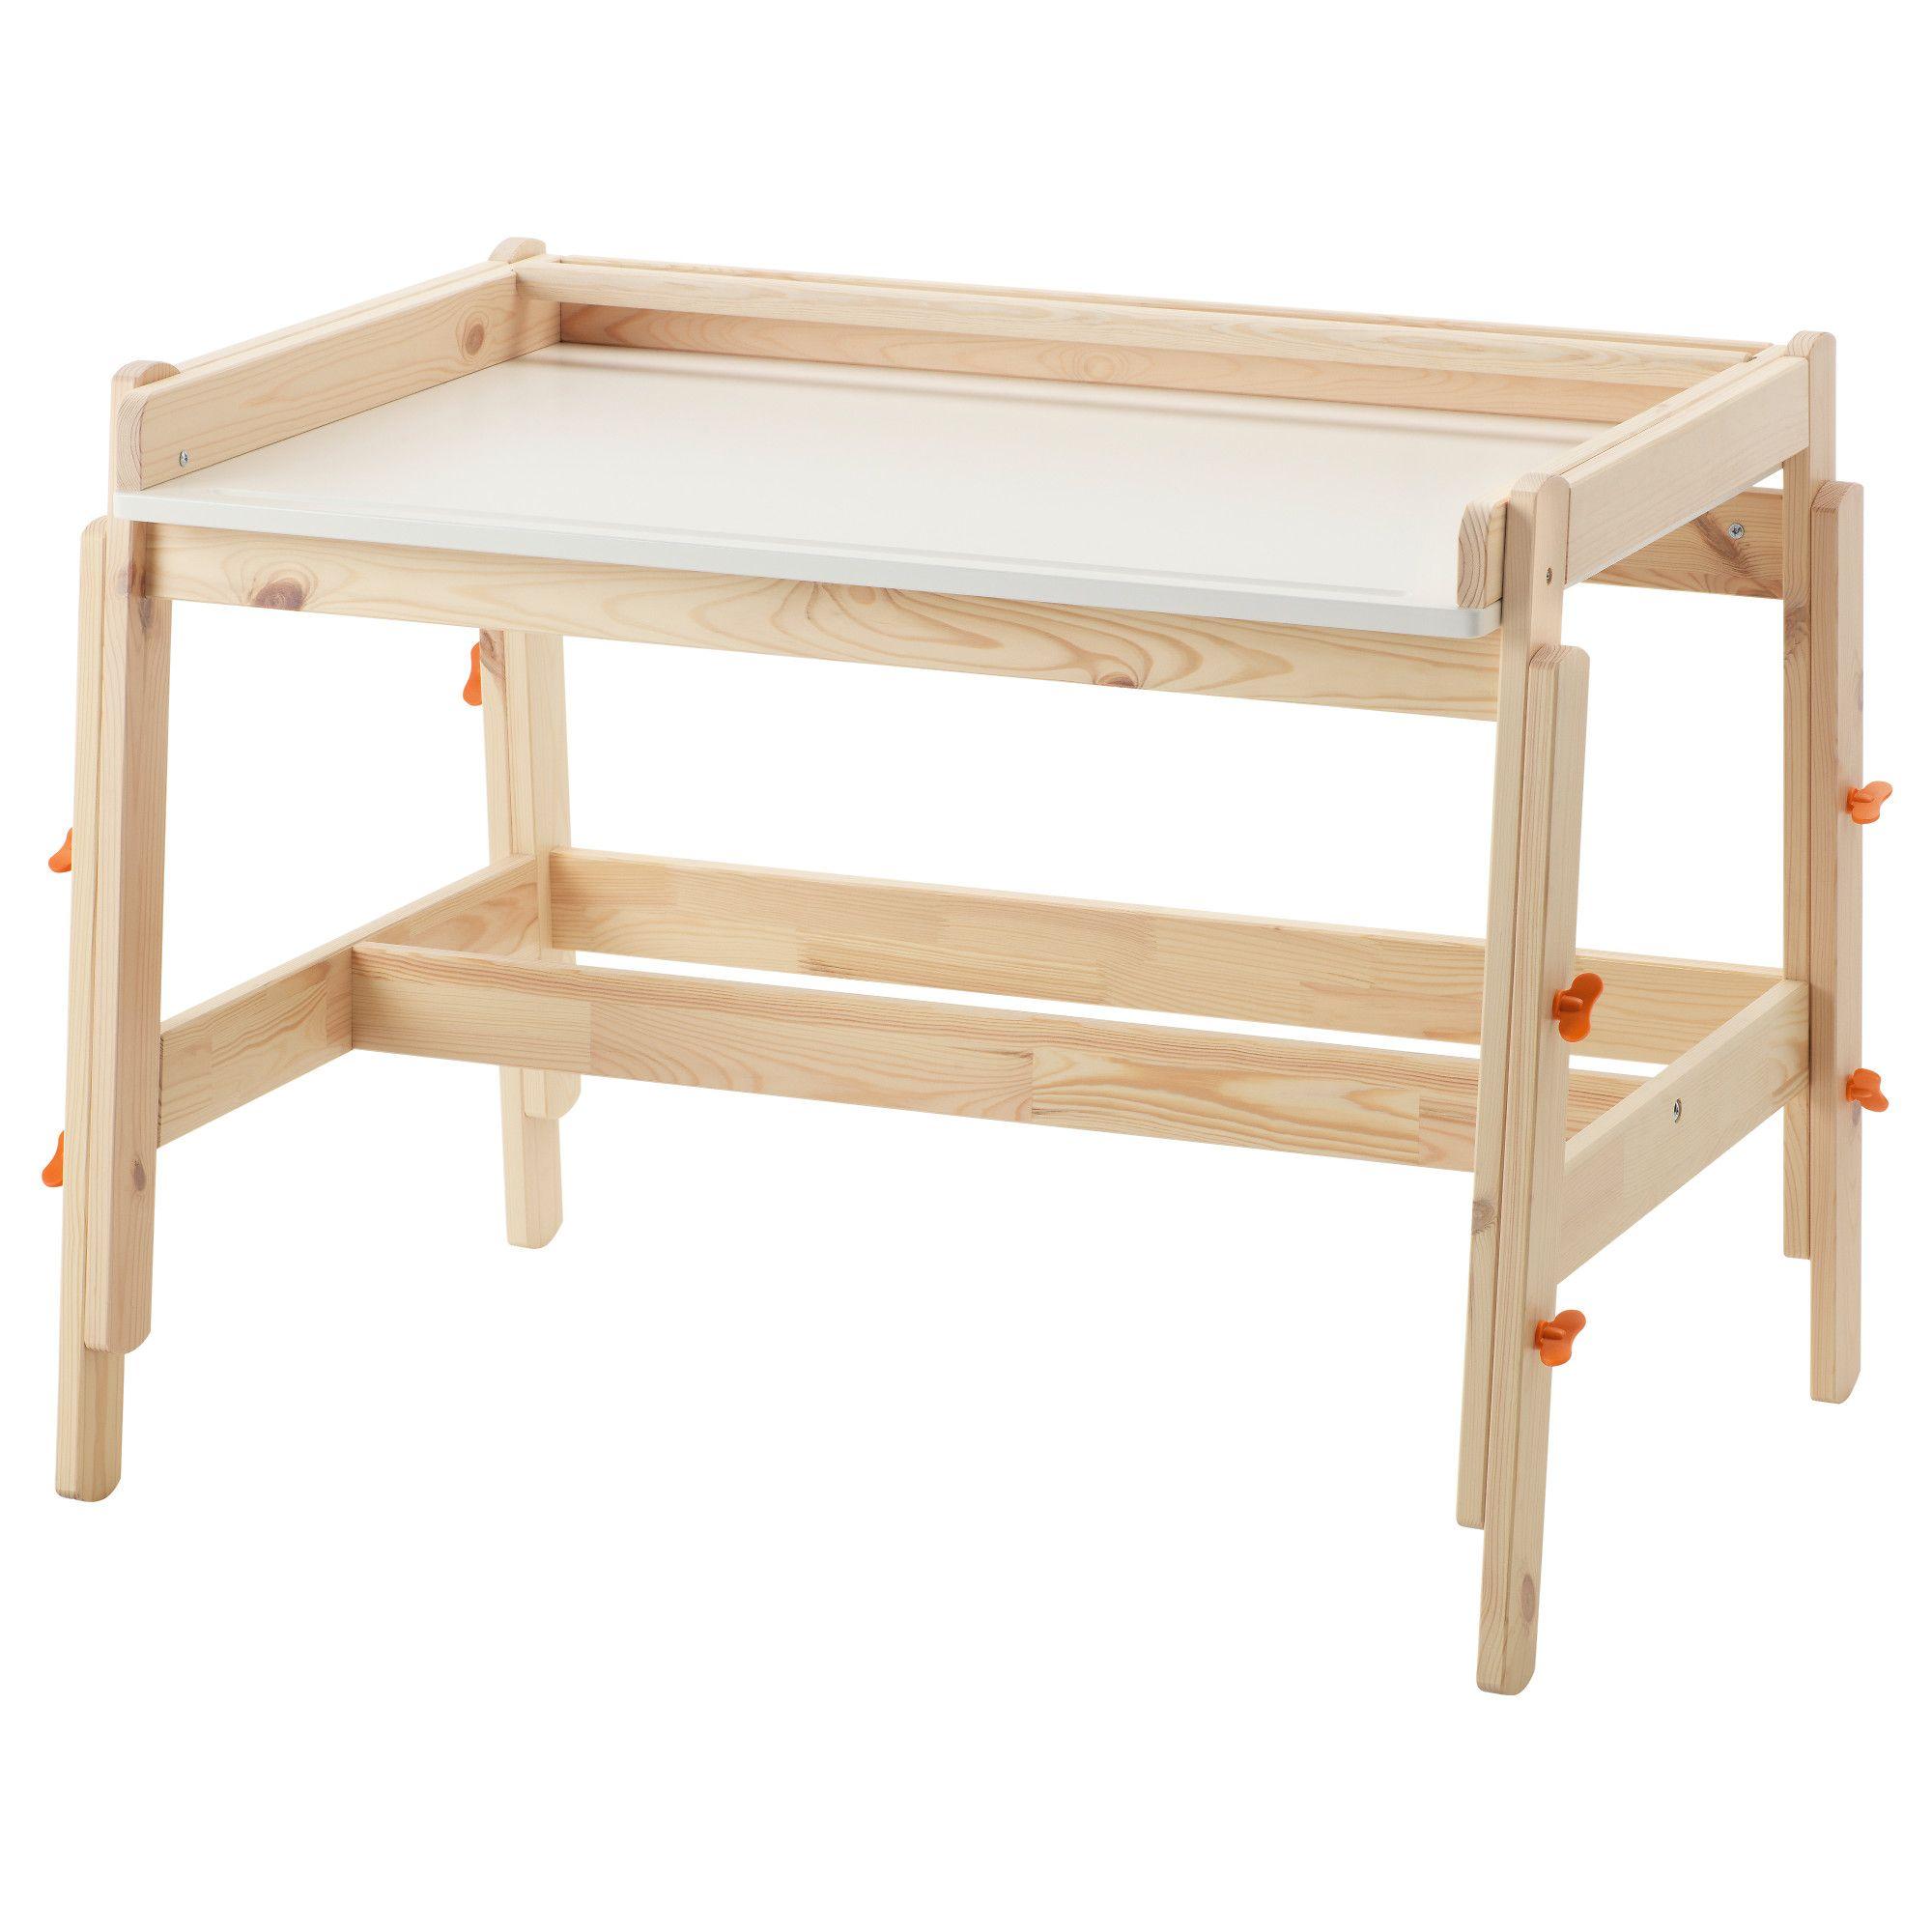 IKEA   FLISAT Childrenu0027s Desk Adjustable